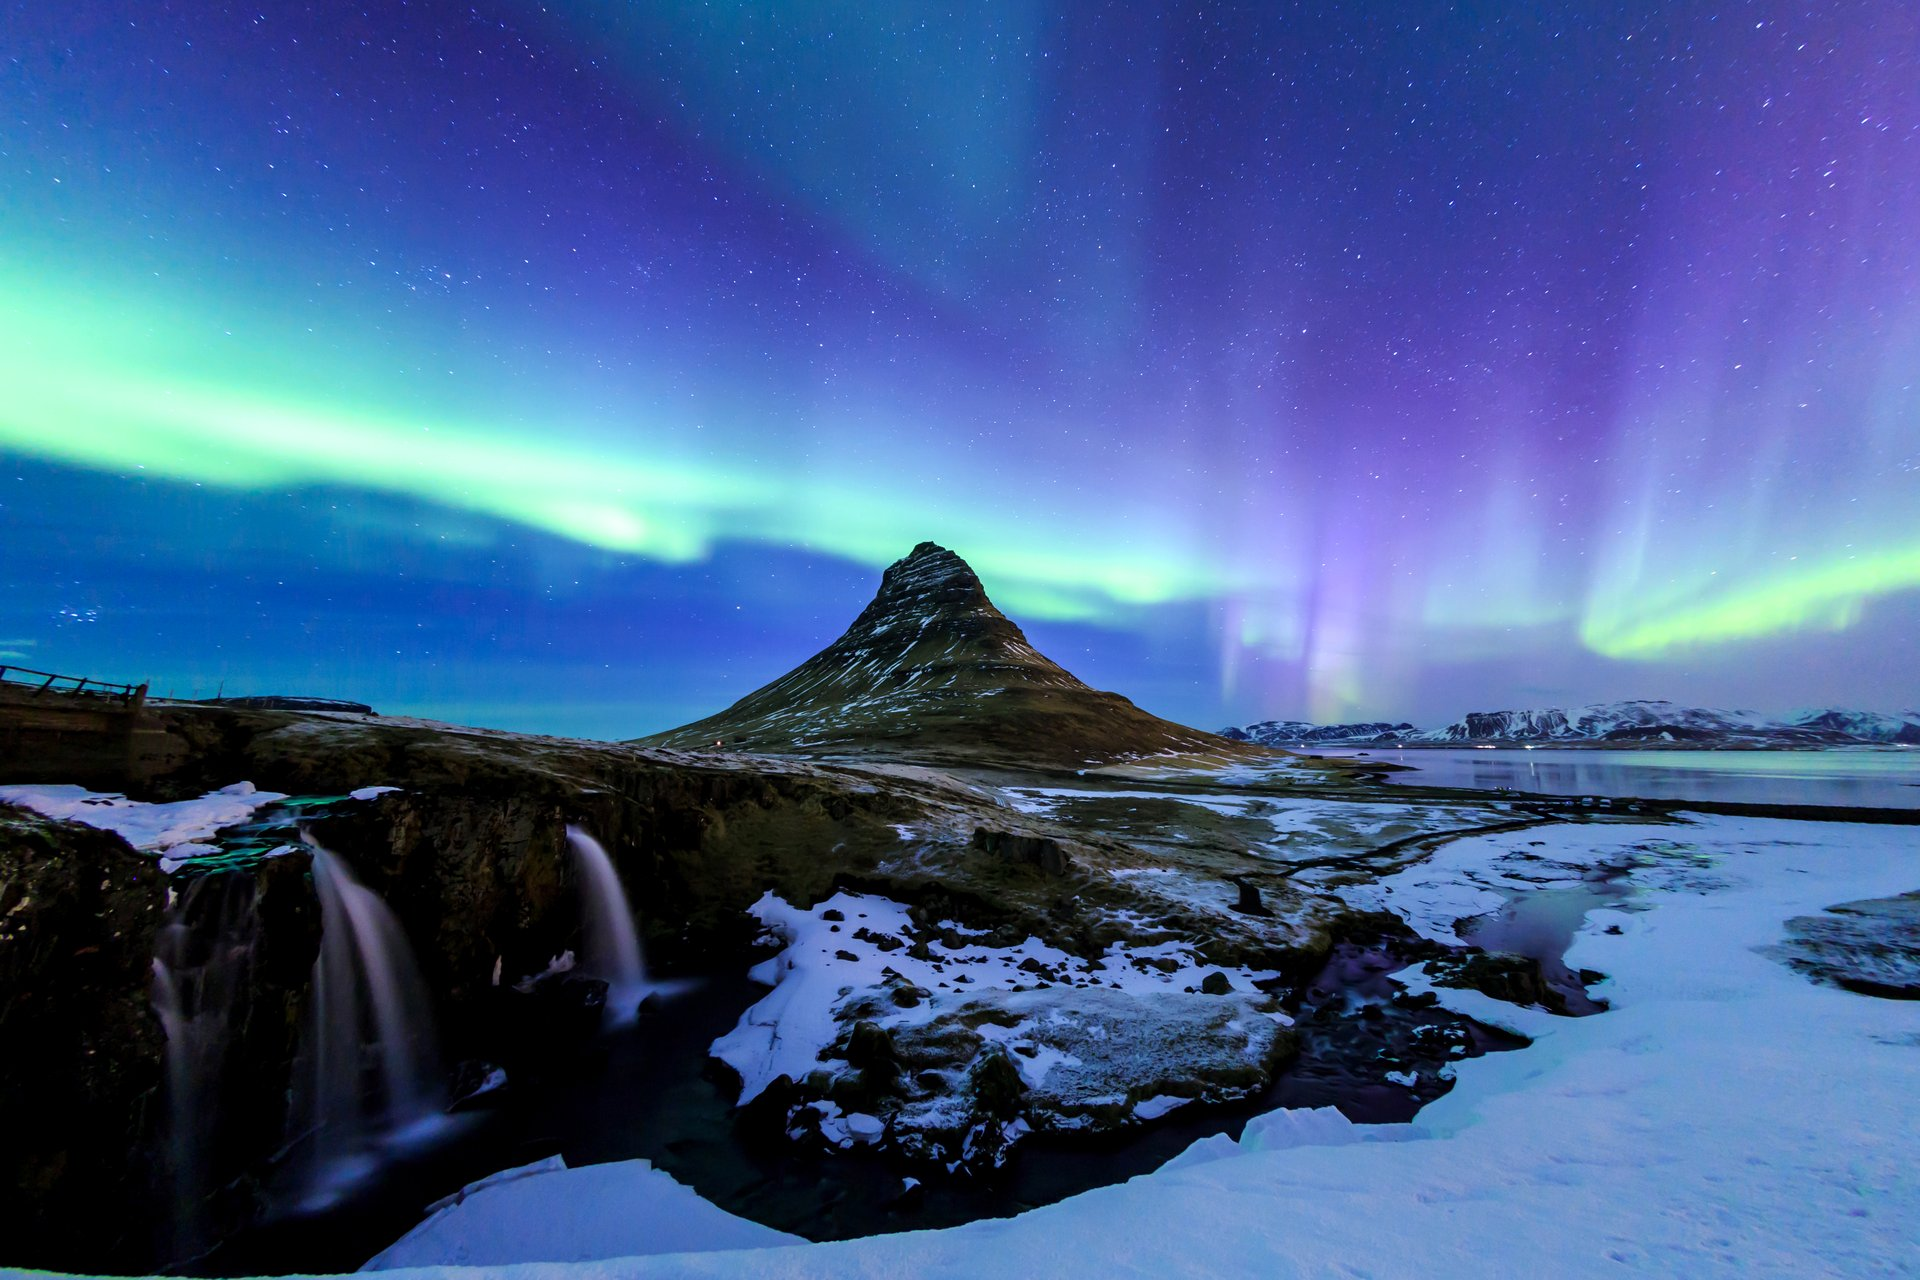 Best Go Iceland Northern Lights Time